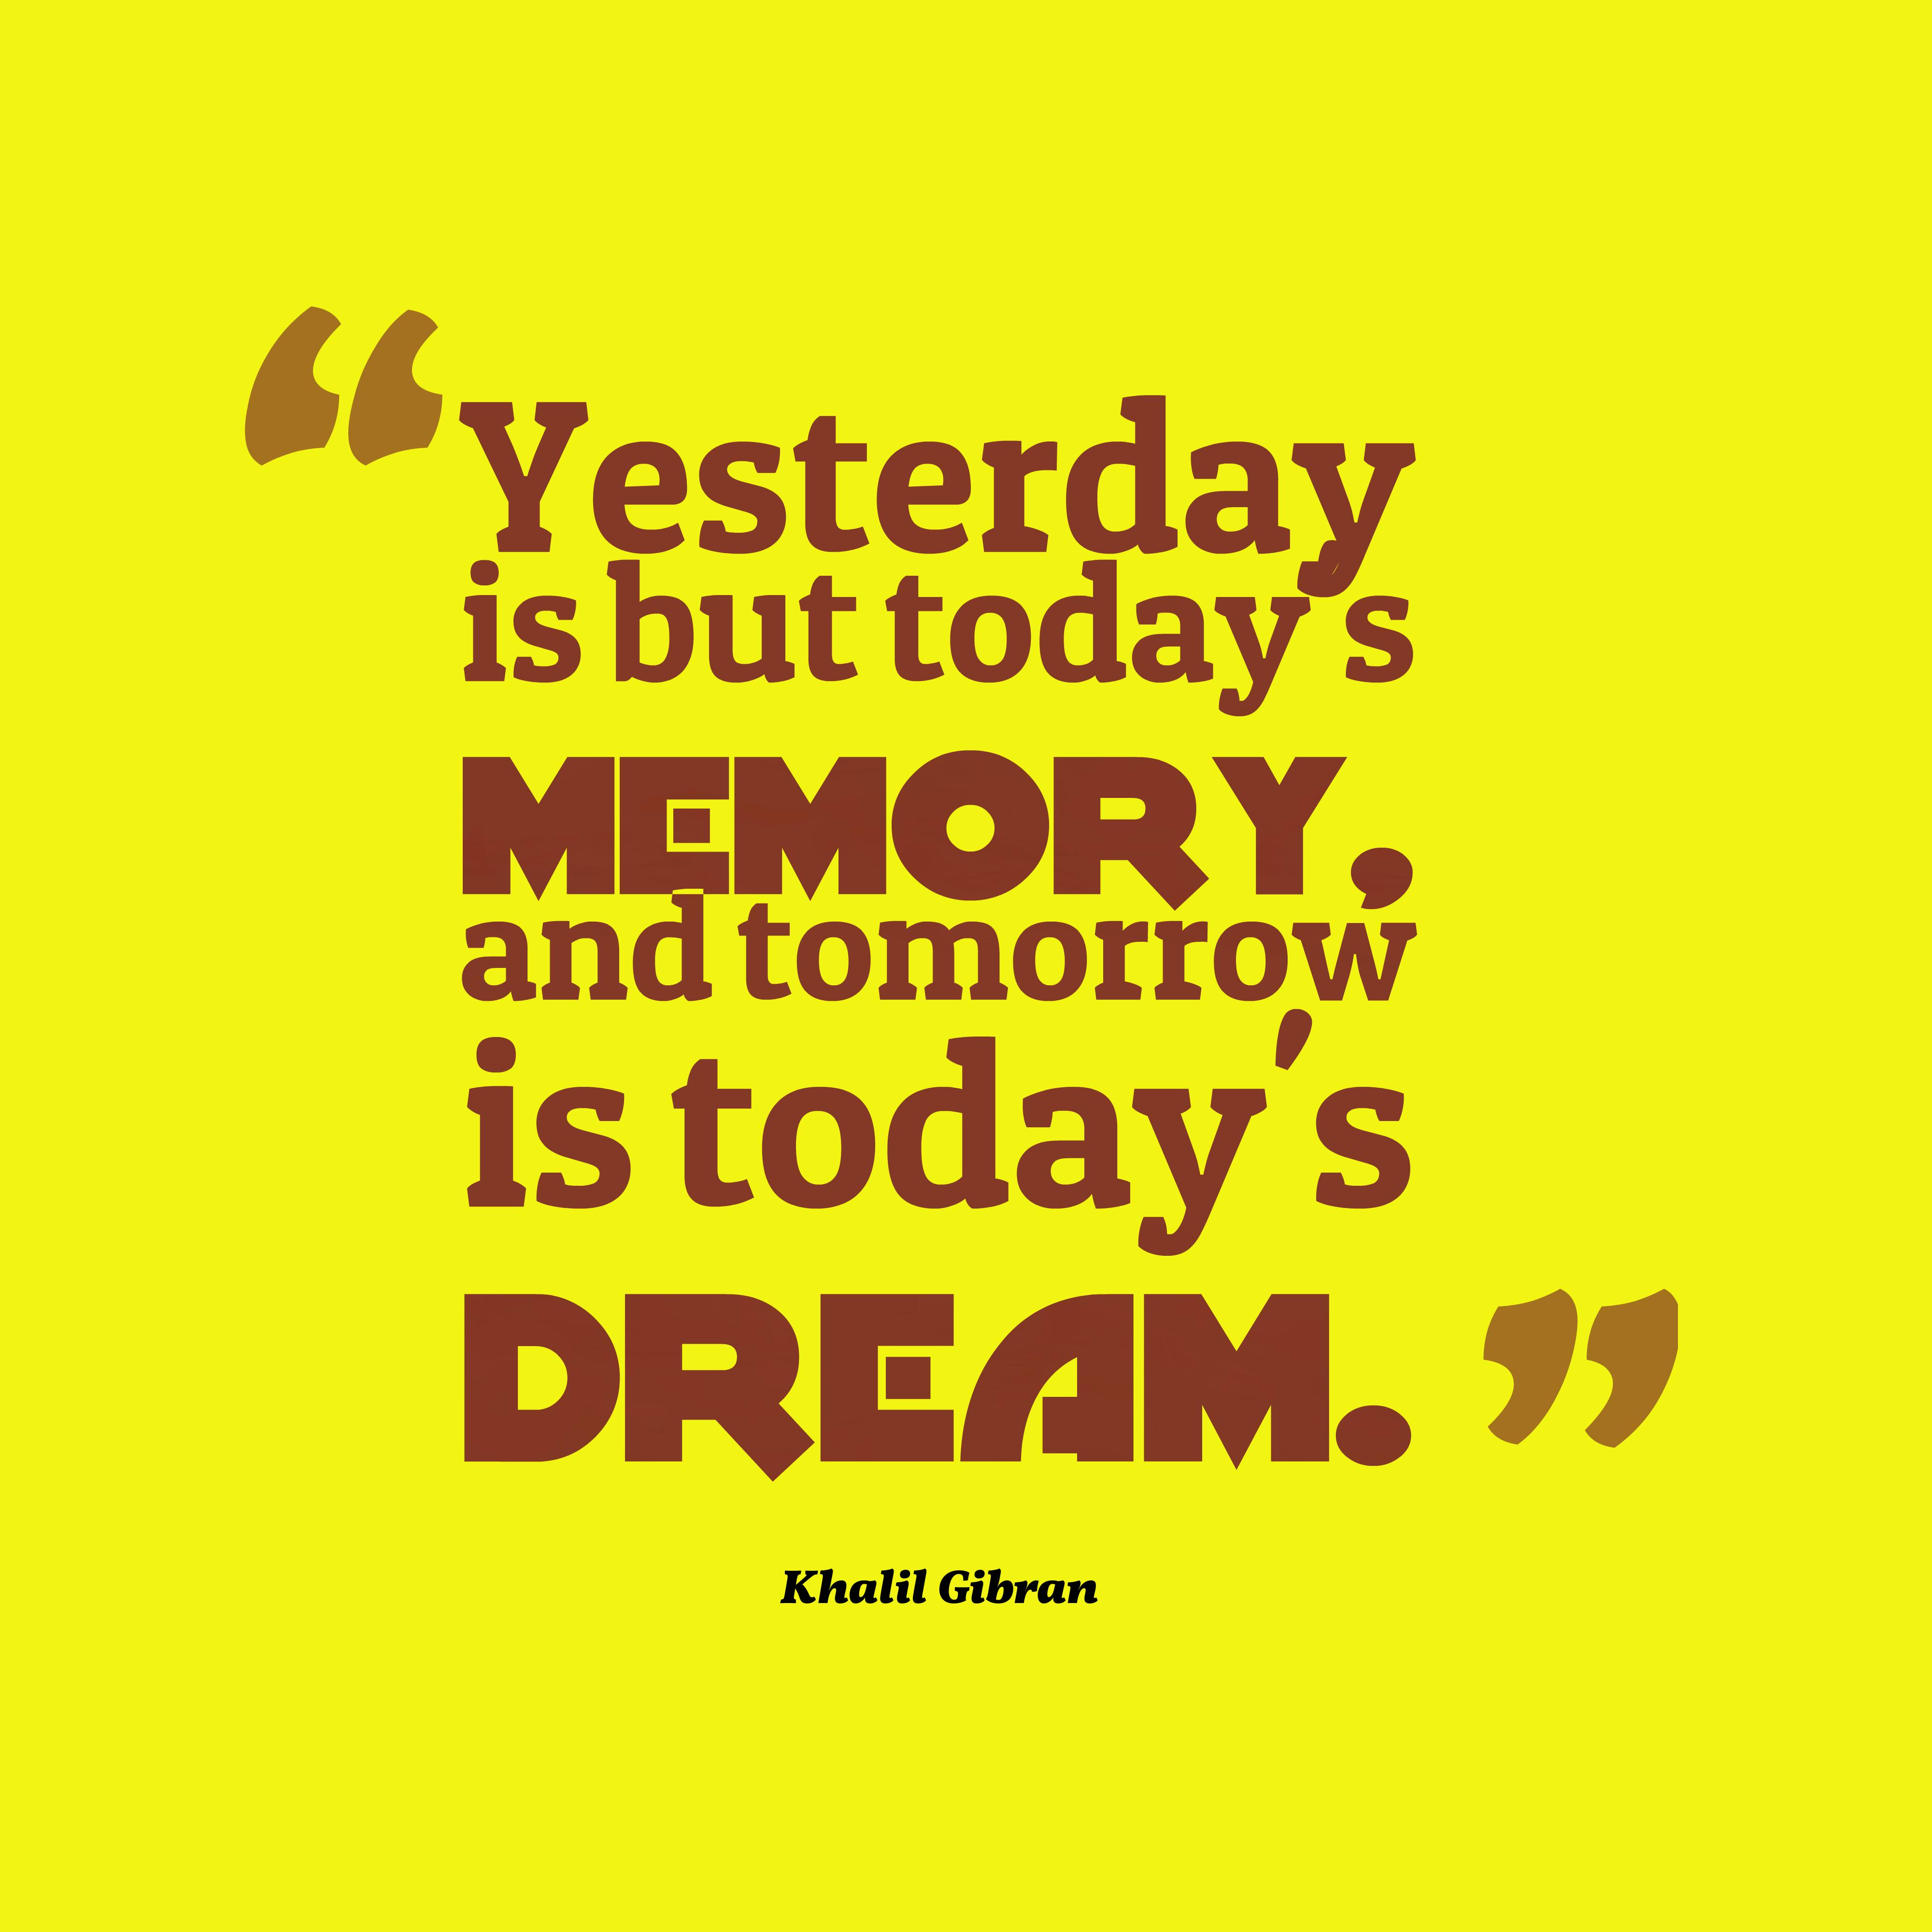 Khalil Gibran Quote About Dream